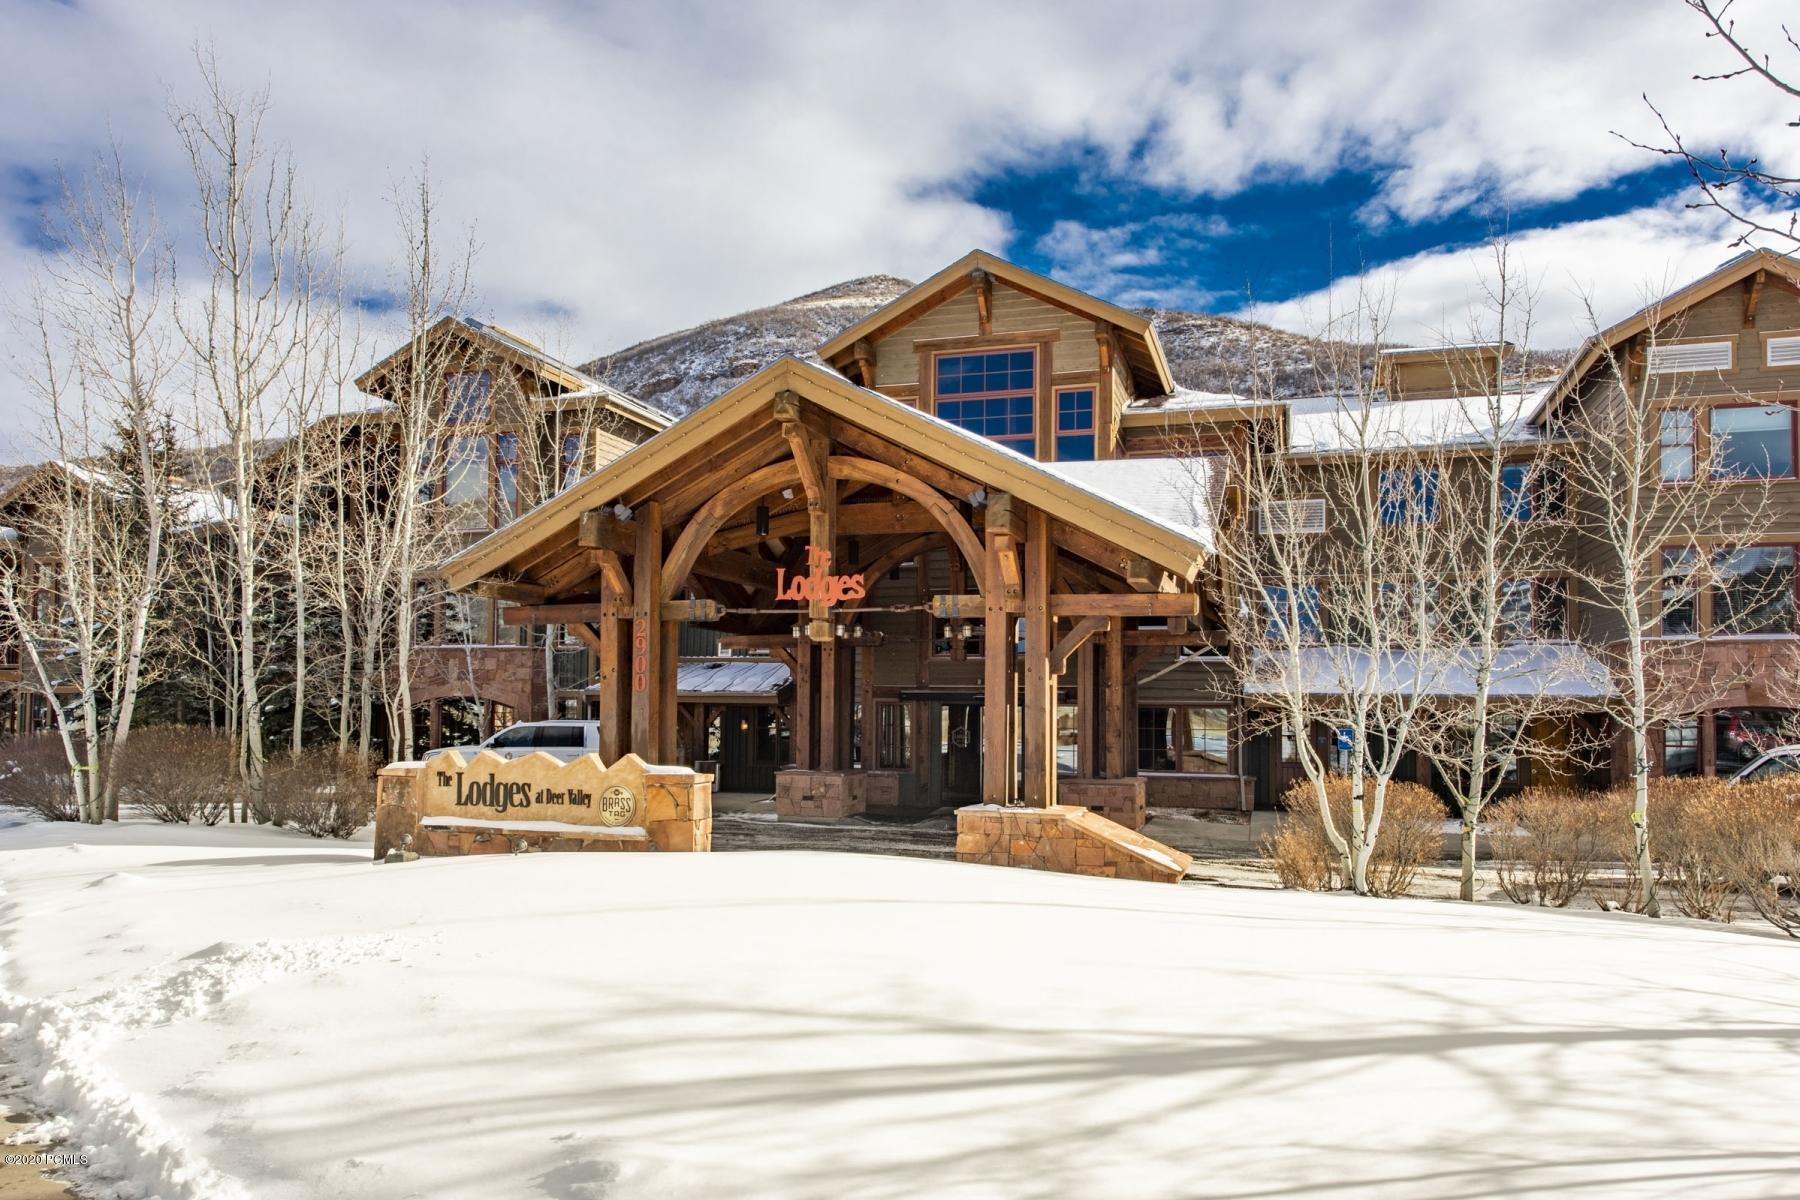 2900 Deer Valley Drive, Park City, Utah 84060, 3 Bedrooms Bedrooms, ,4 BathroomsBathrooms,Condominium,For Sale,Deer Valley,20190109112430415765000000